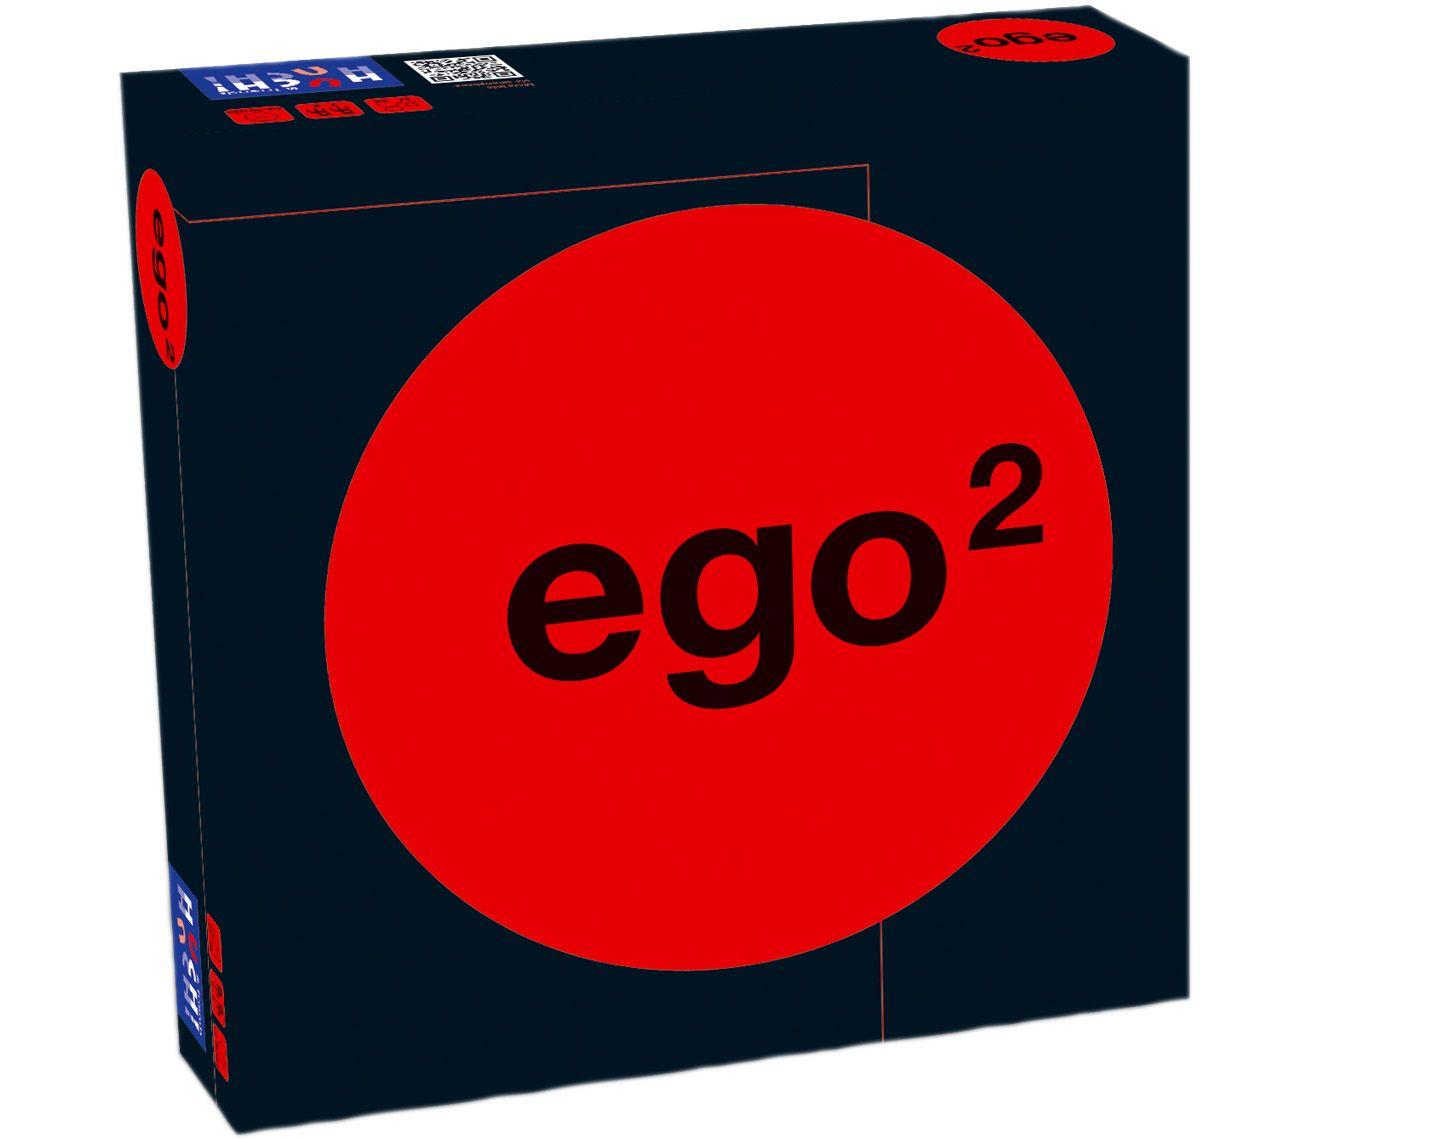 HUCH FRIENDS Huch! & friends Gesellschaftsspiel, »ego²«